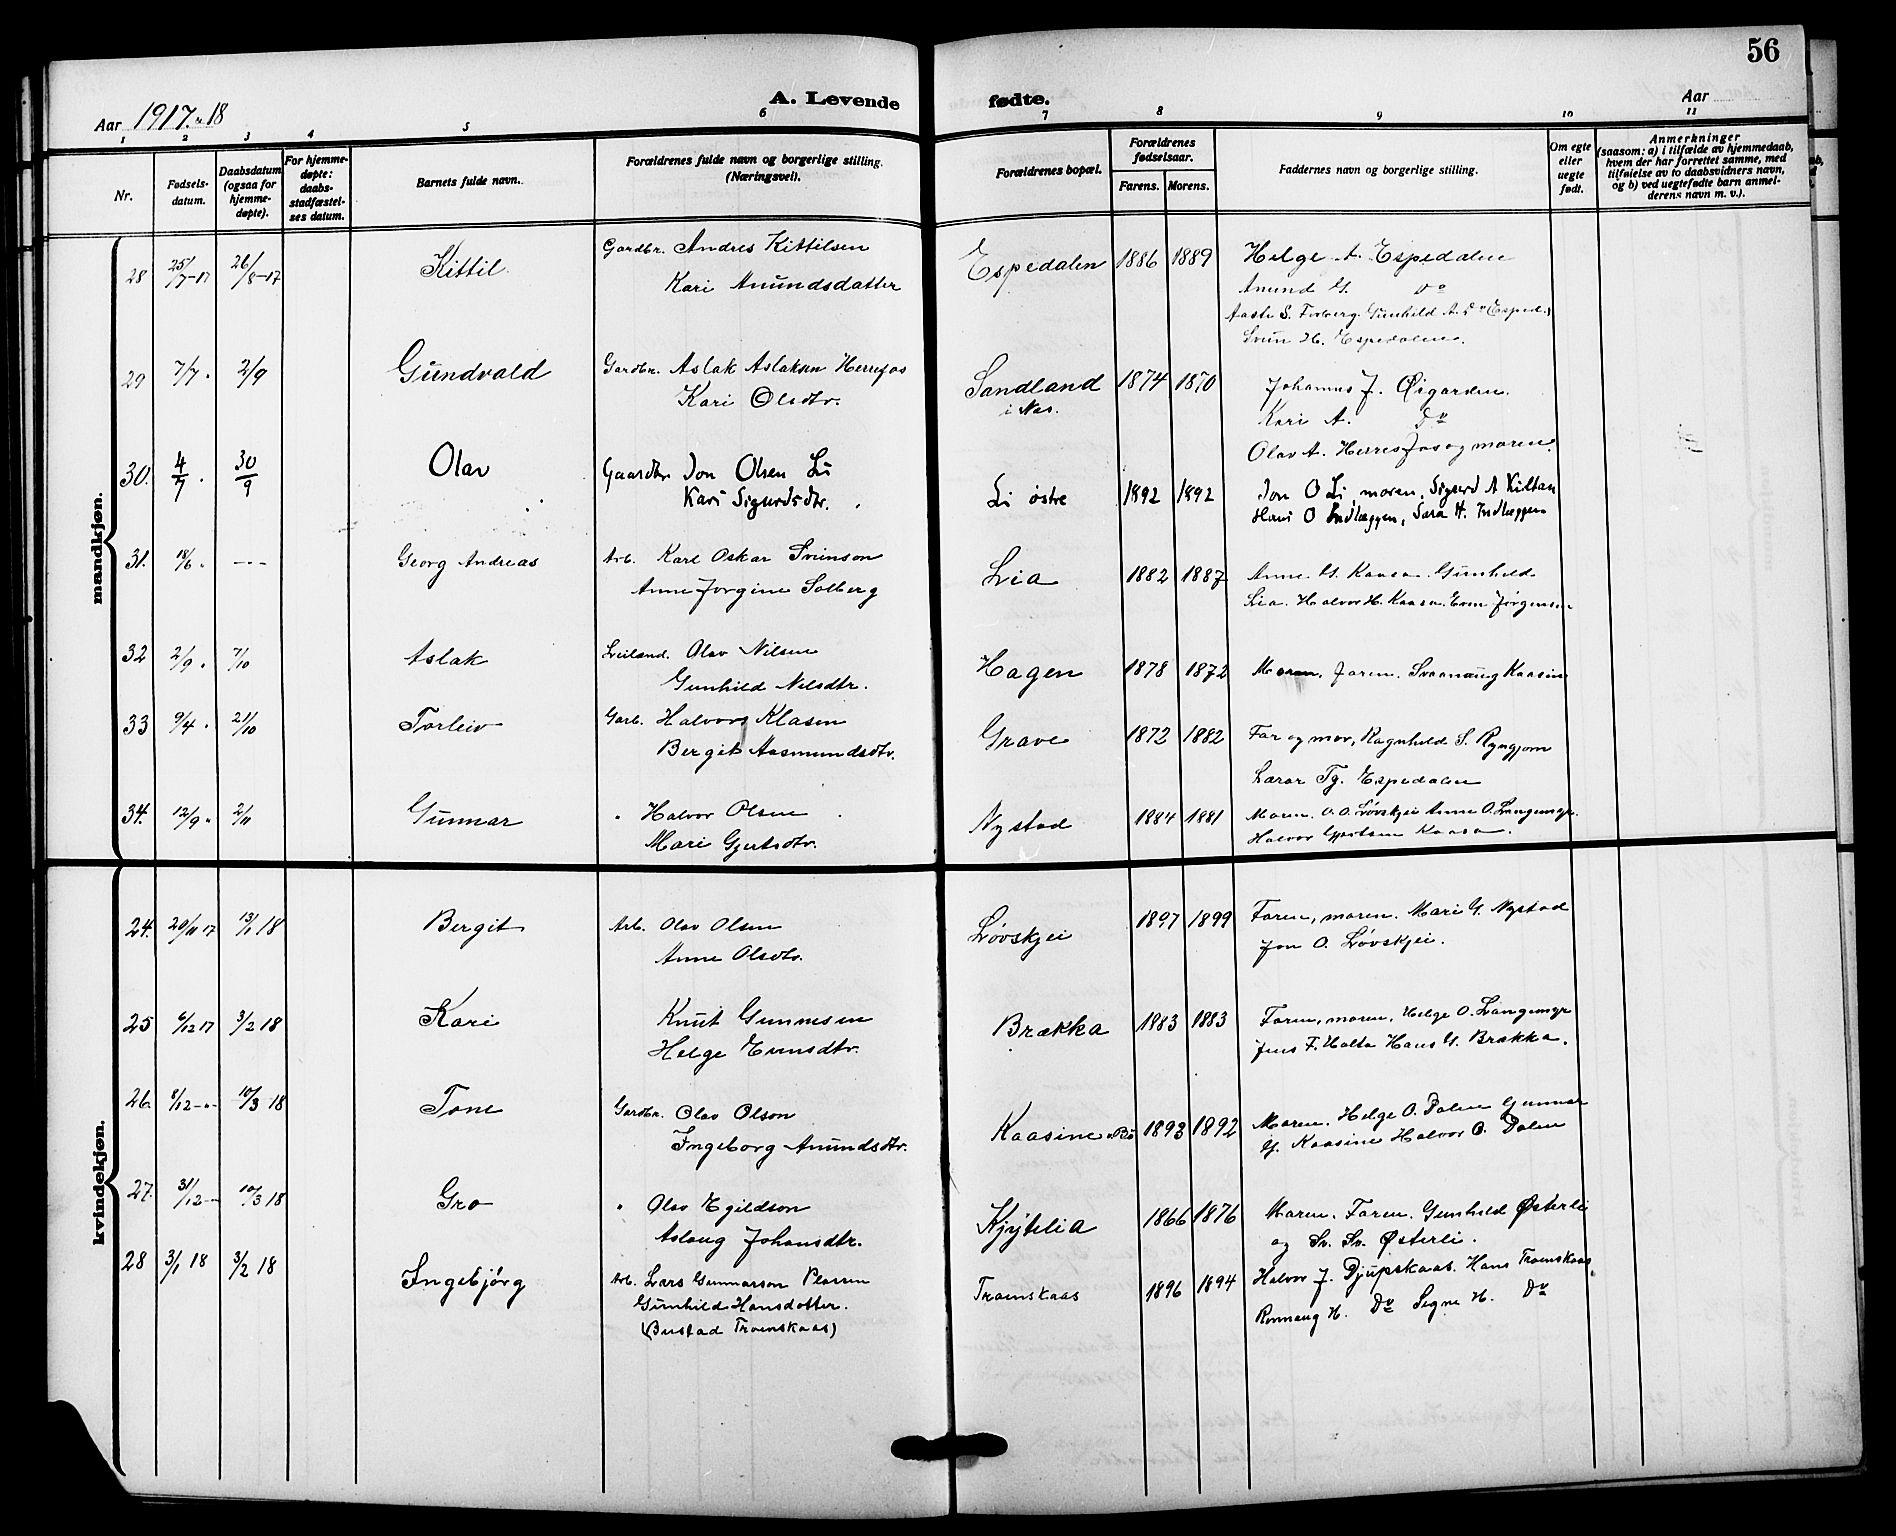 SAKO, Bø kirkebøker, G/Ga/L0007: Klokkerbok nr. 7, 1909-1924, s. 56